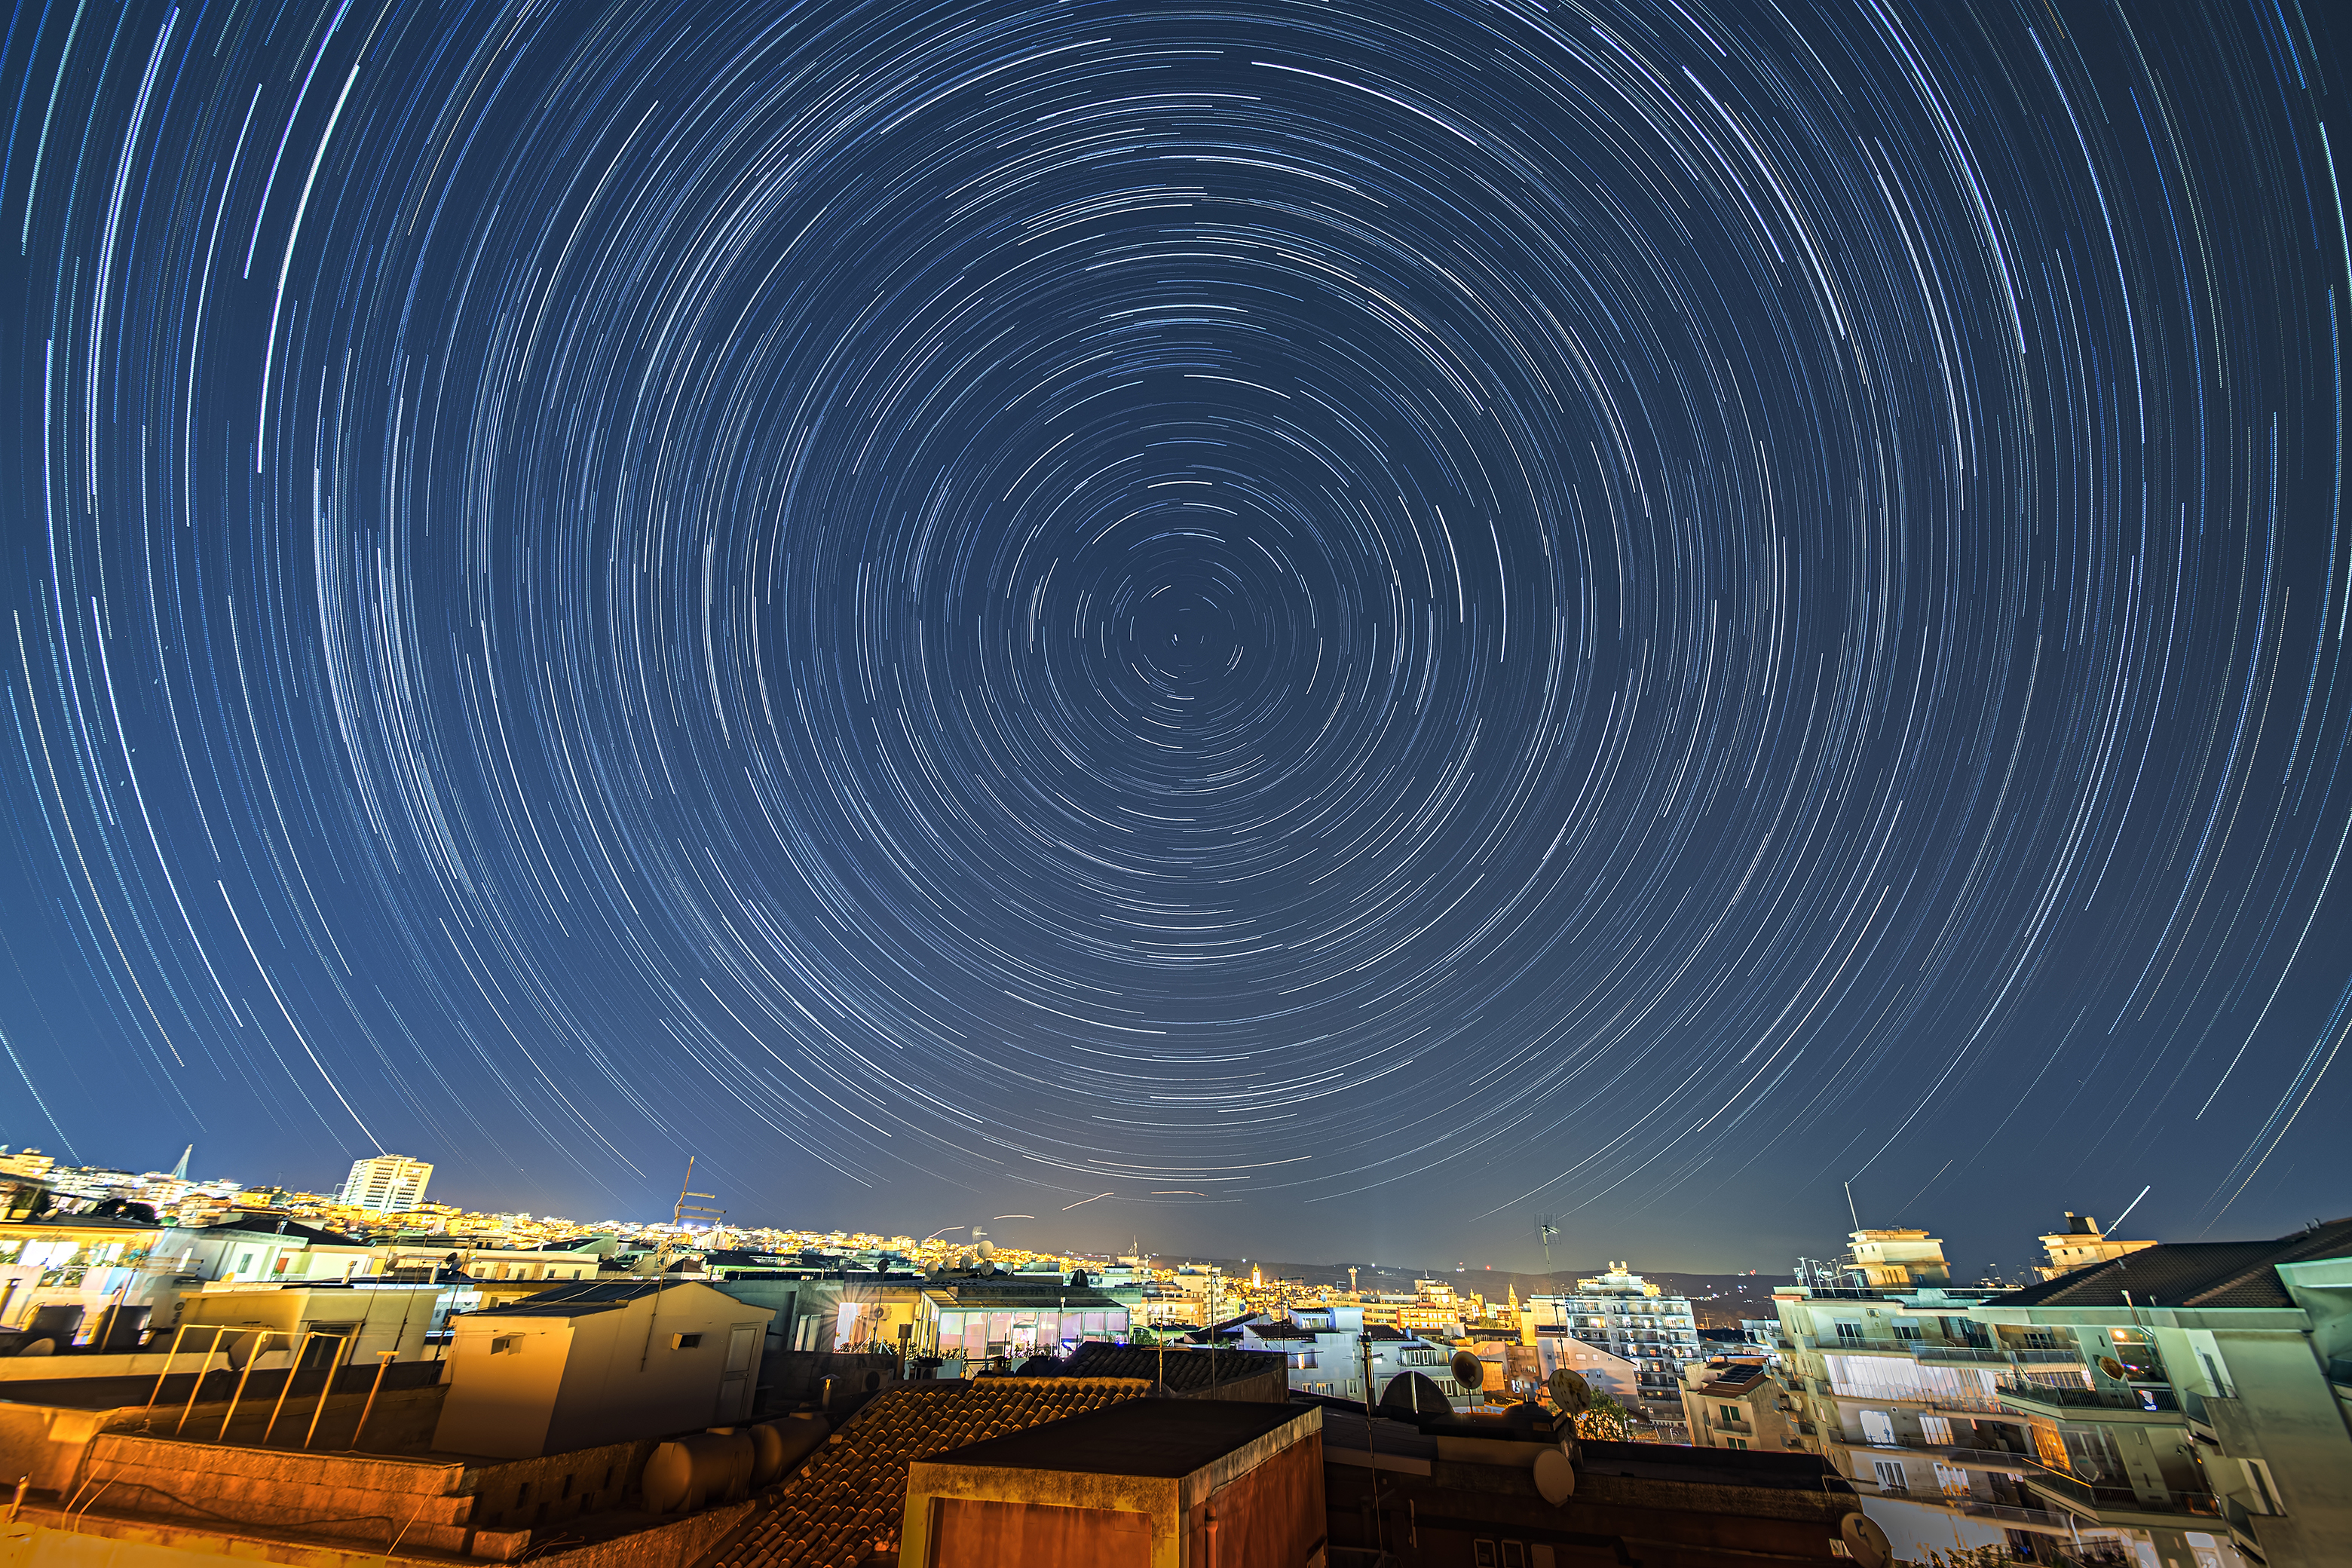 Stars Trail over Ragusa